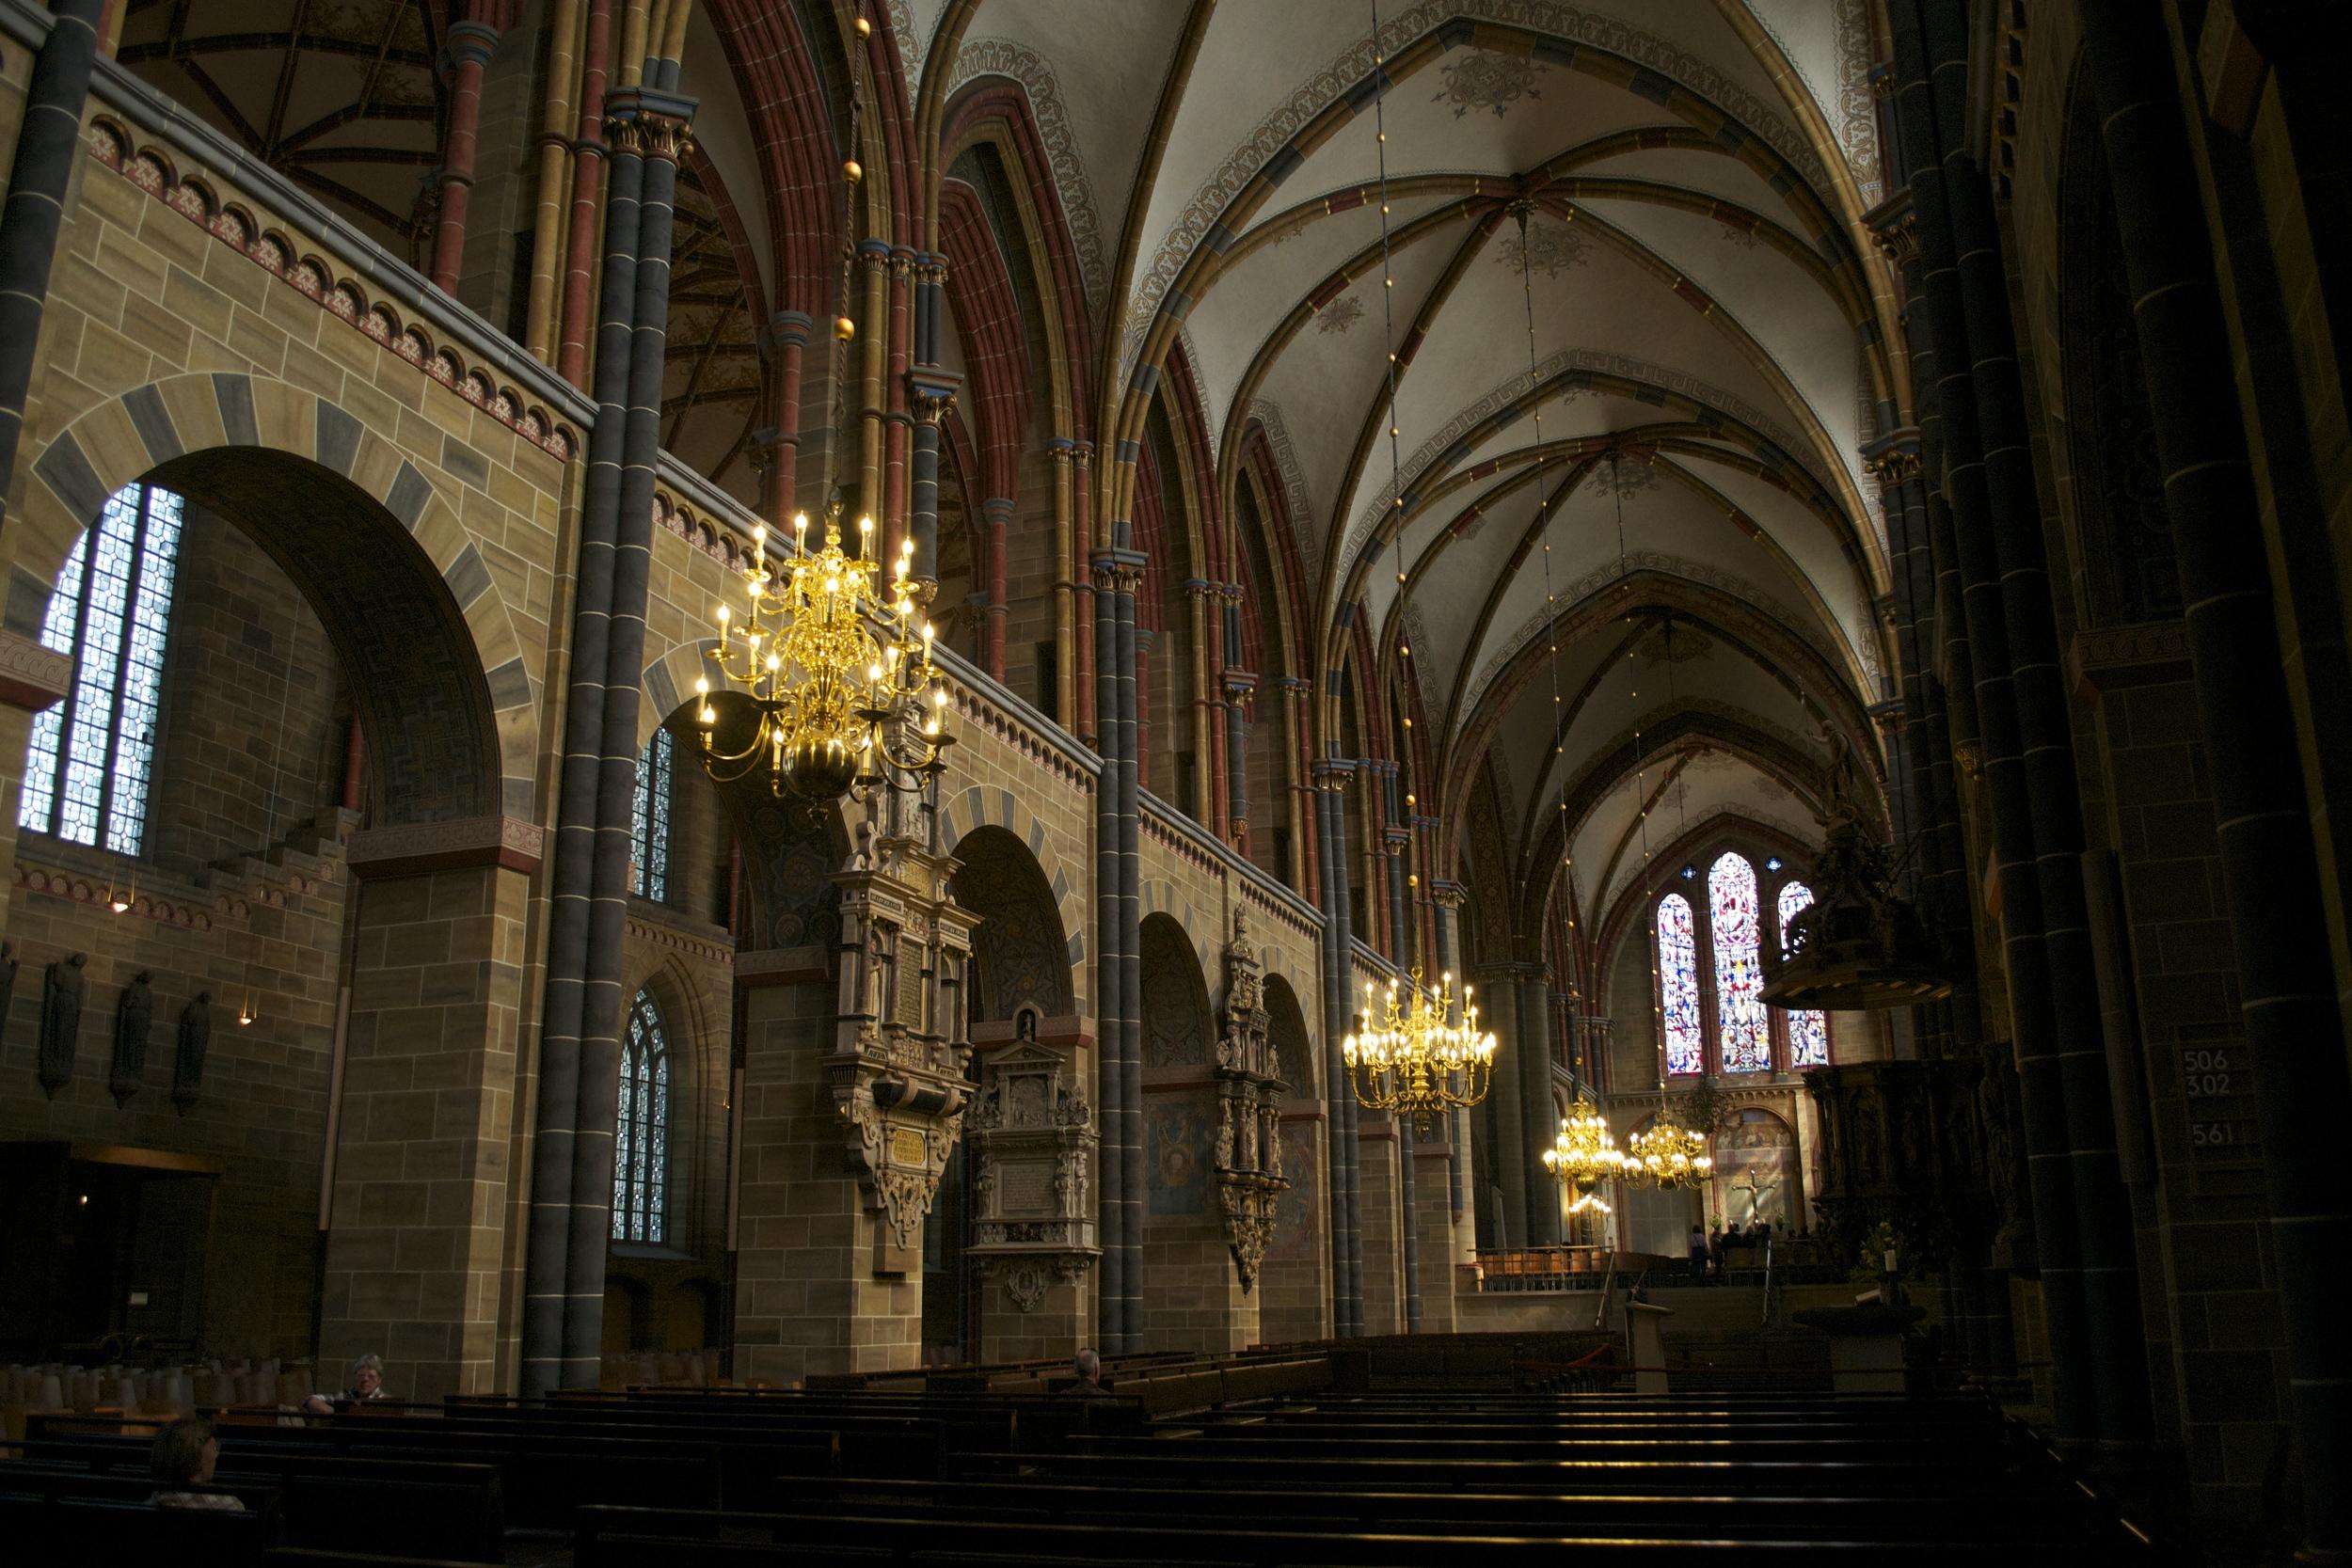 Inside the St. Petri Dom.